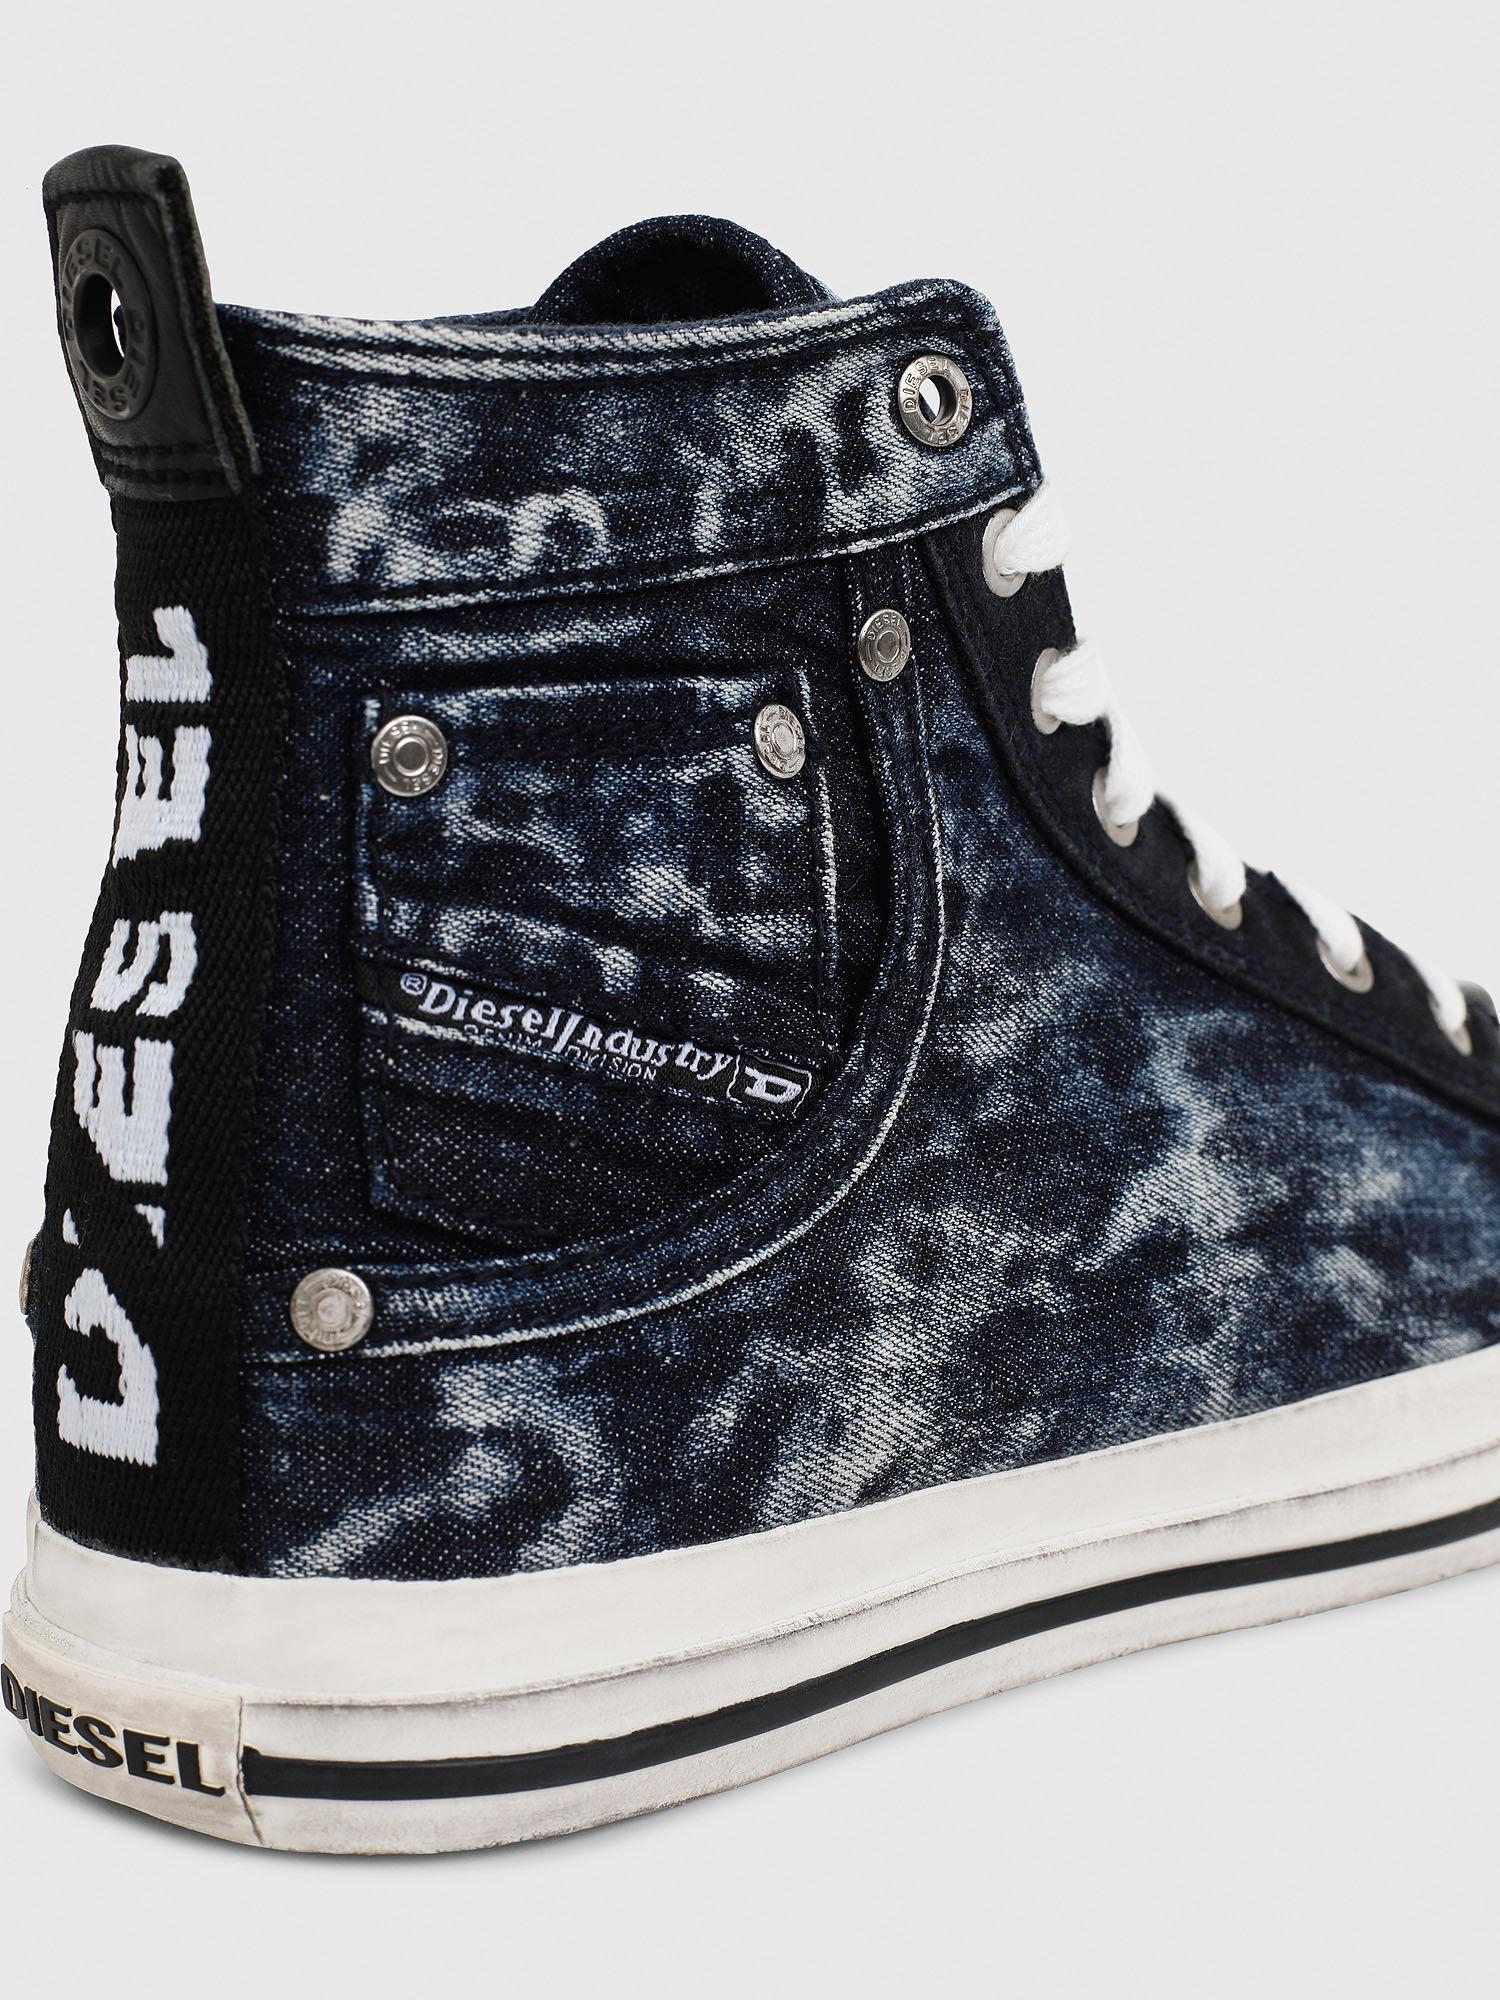 High-top sneakers in distressed denim